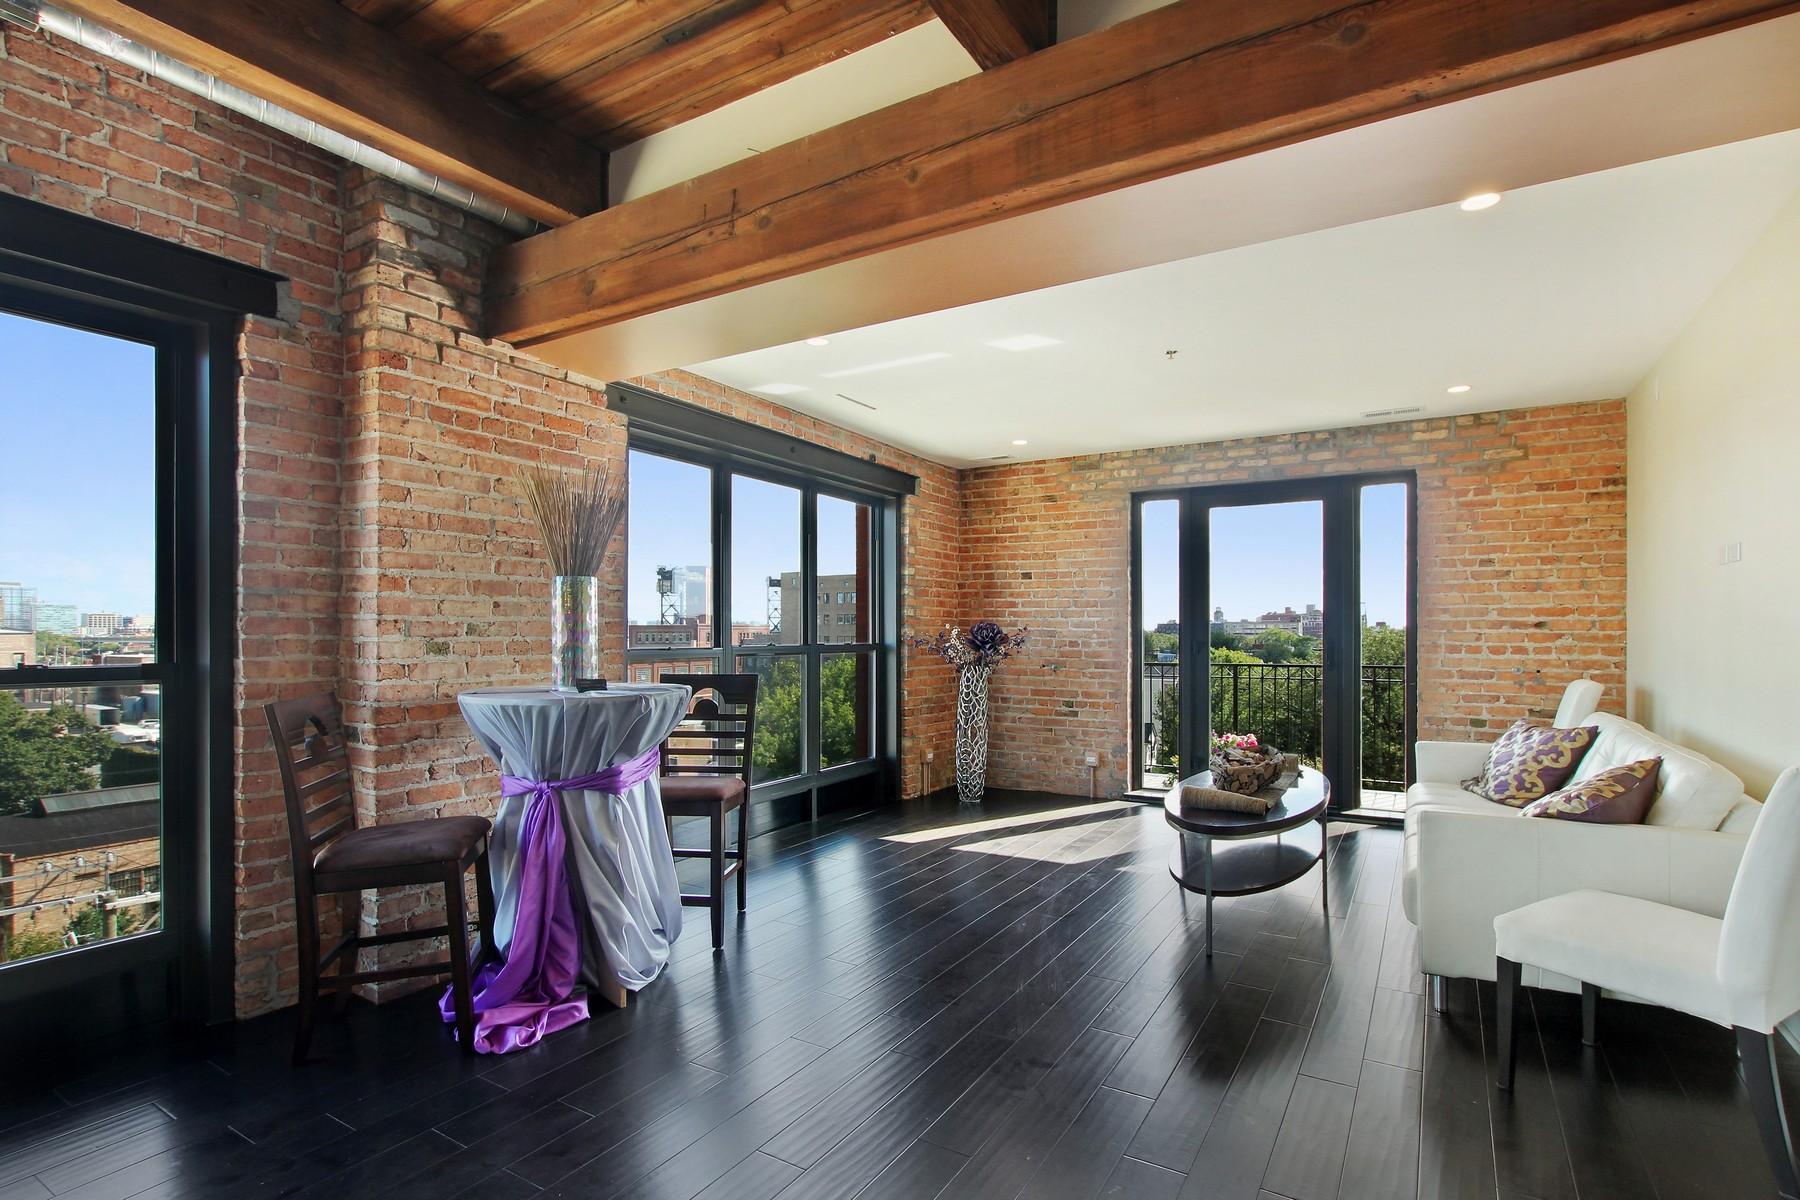 独户住宅 为 销售 在 Two Bedroom Pilsen Loft 1600 S Jefferson Street Unit 305 Pilsen (Lower West Side), 芝加哥, 伊利诺斯州 60616 美国